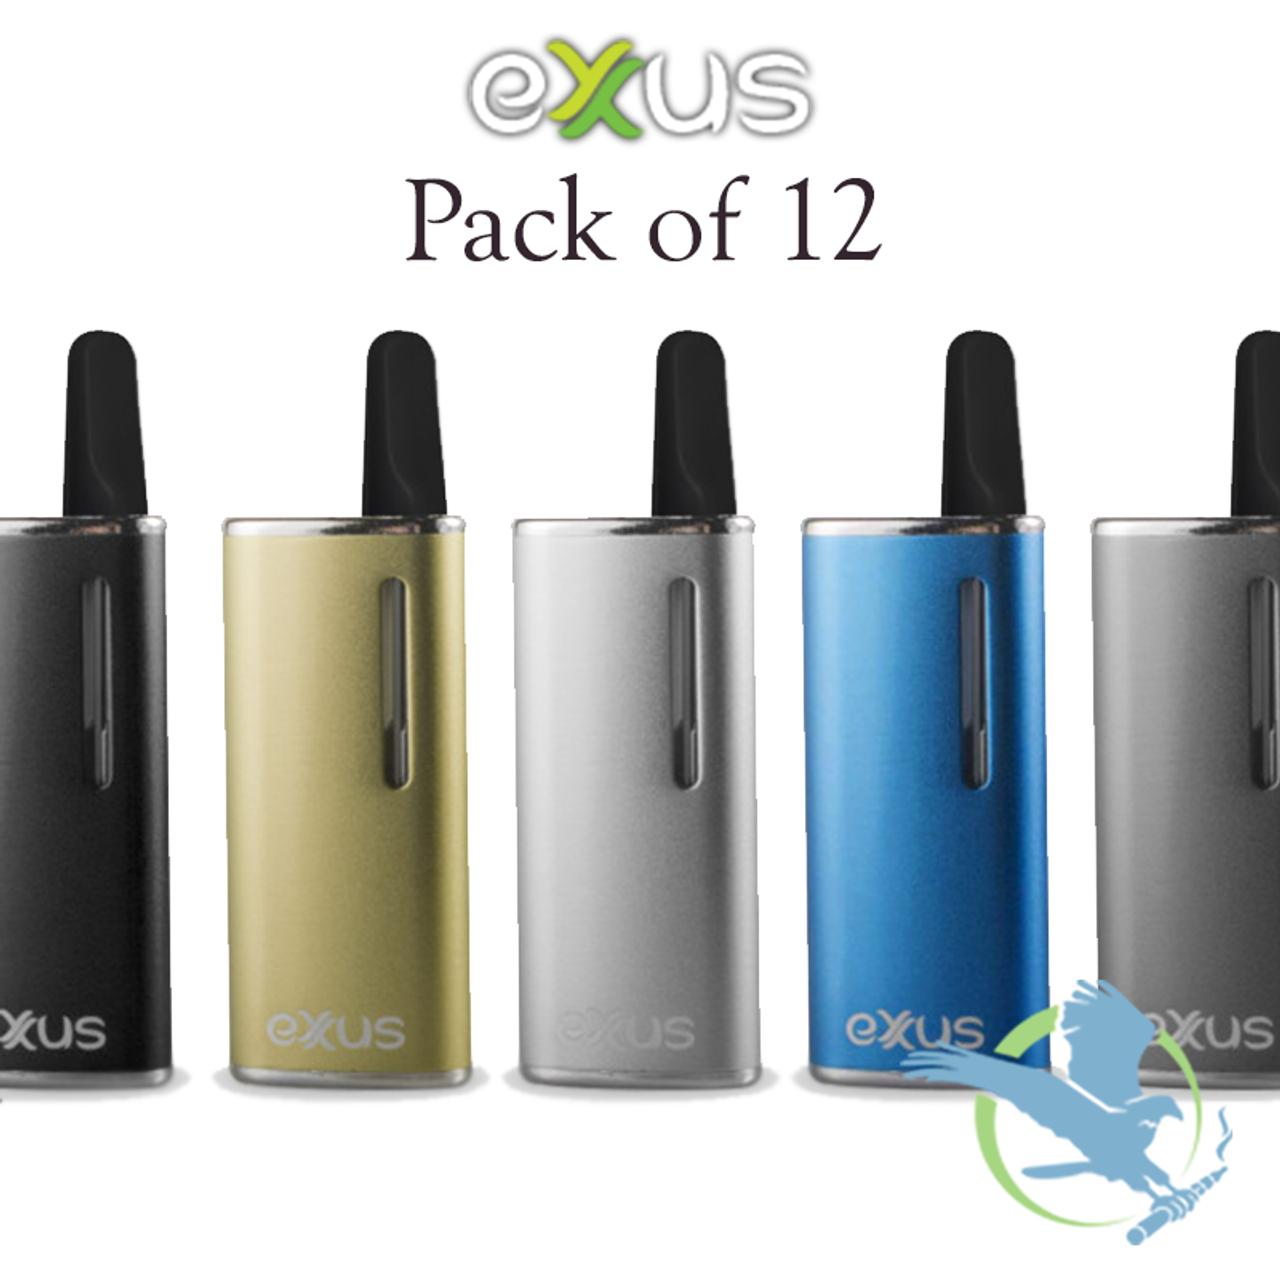 Exxus Snap Cartridge Vaporizer Pack of 12 *DROP SHIPS* (MSRP $30 00 Each)